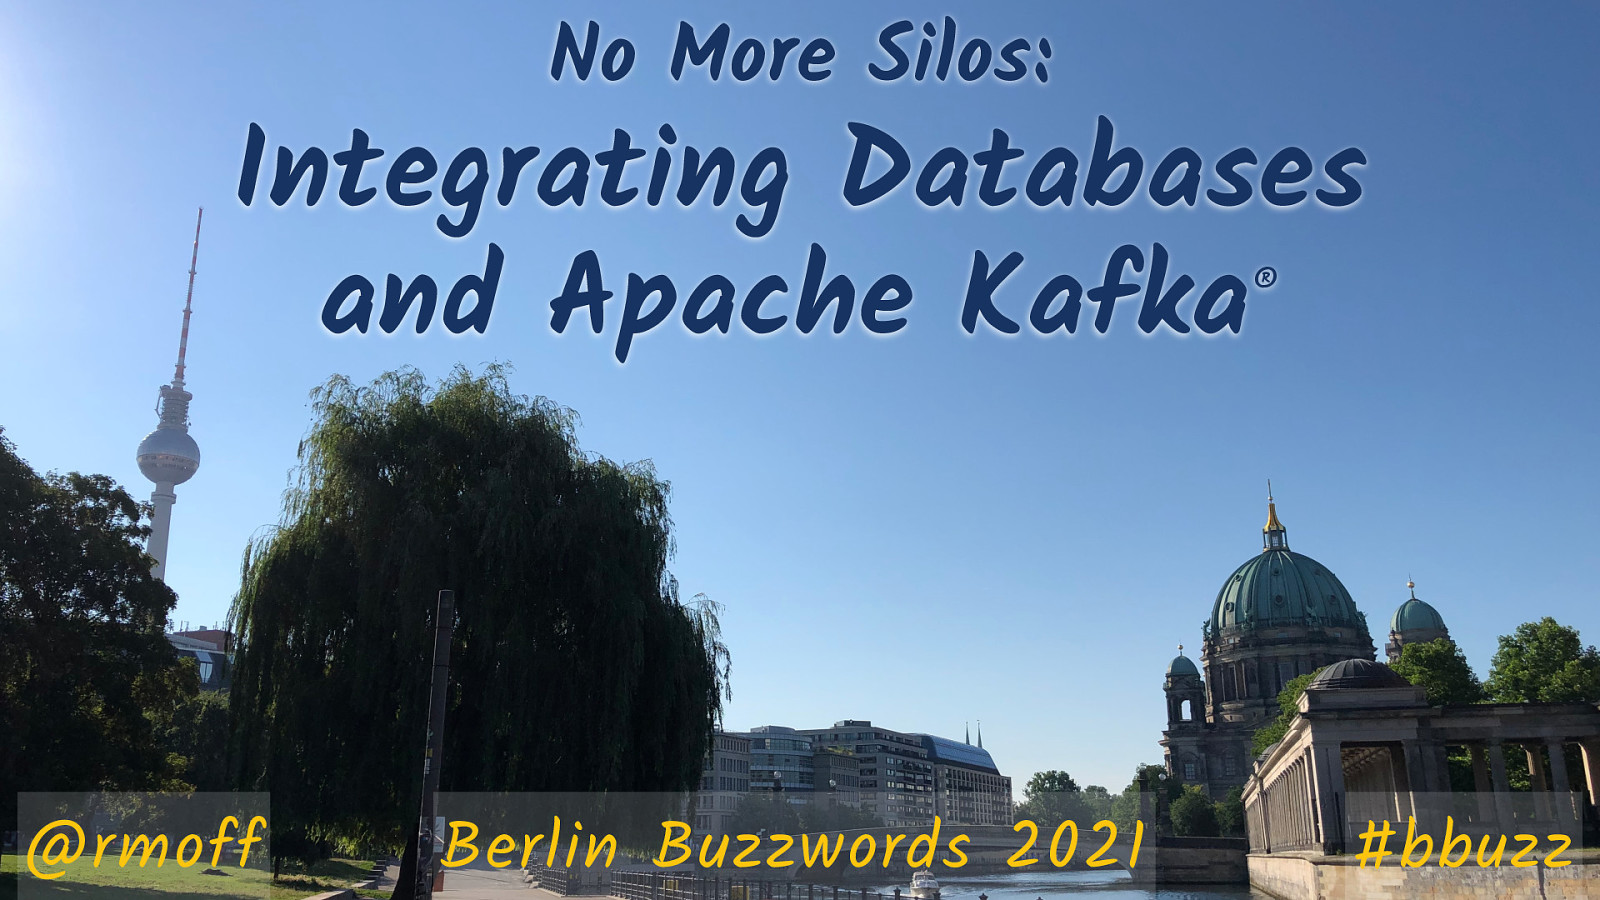 No More Silos: Integrating Databases and Apache Kafka